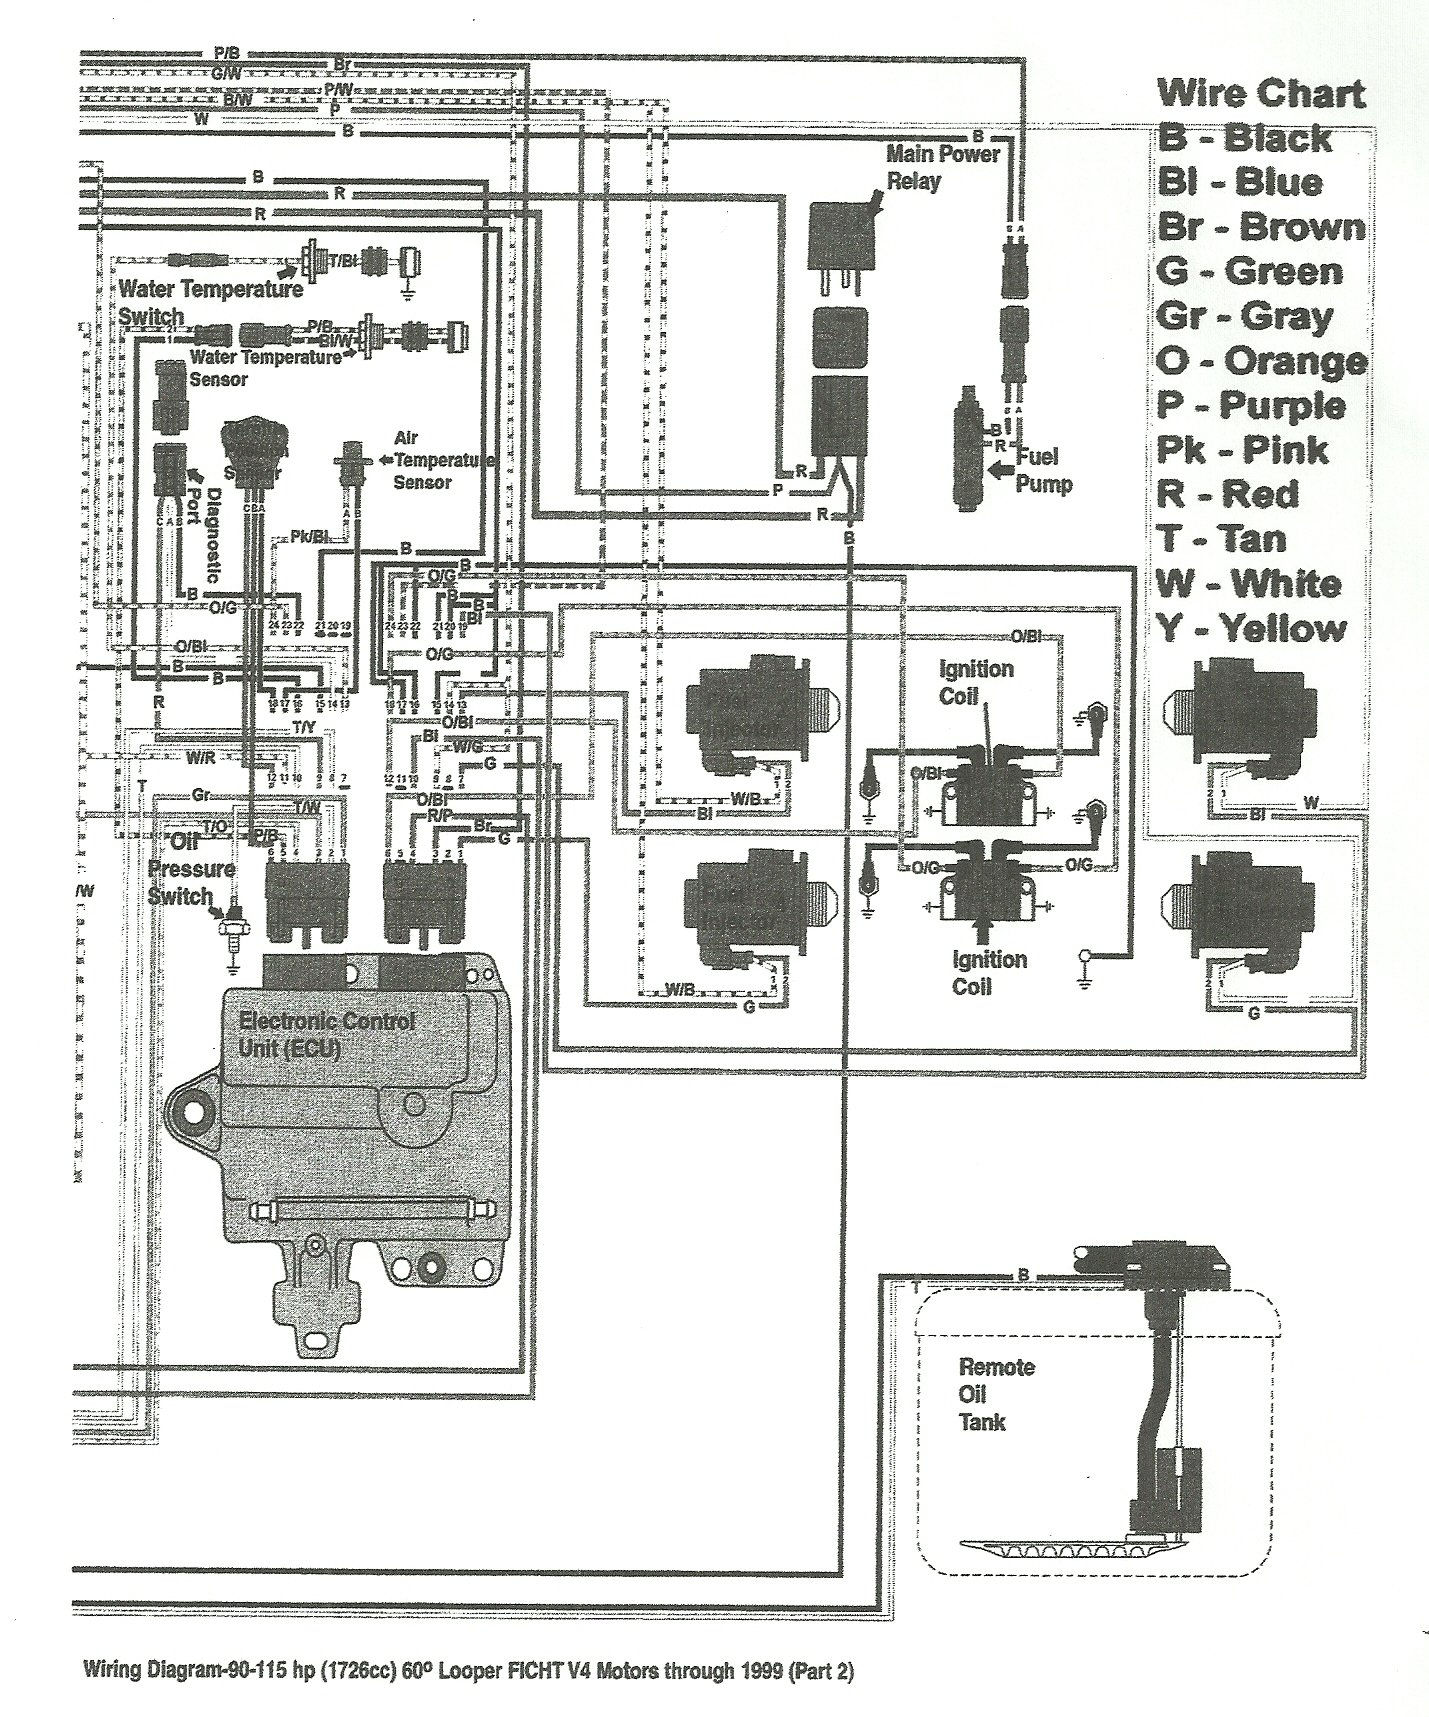 Diagram Winnebago Chieftain Wiring Diagram Full Version Hd Quality Wiring Diagram Enerwiring Media90 It